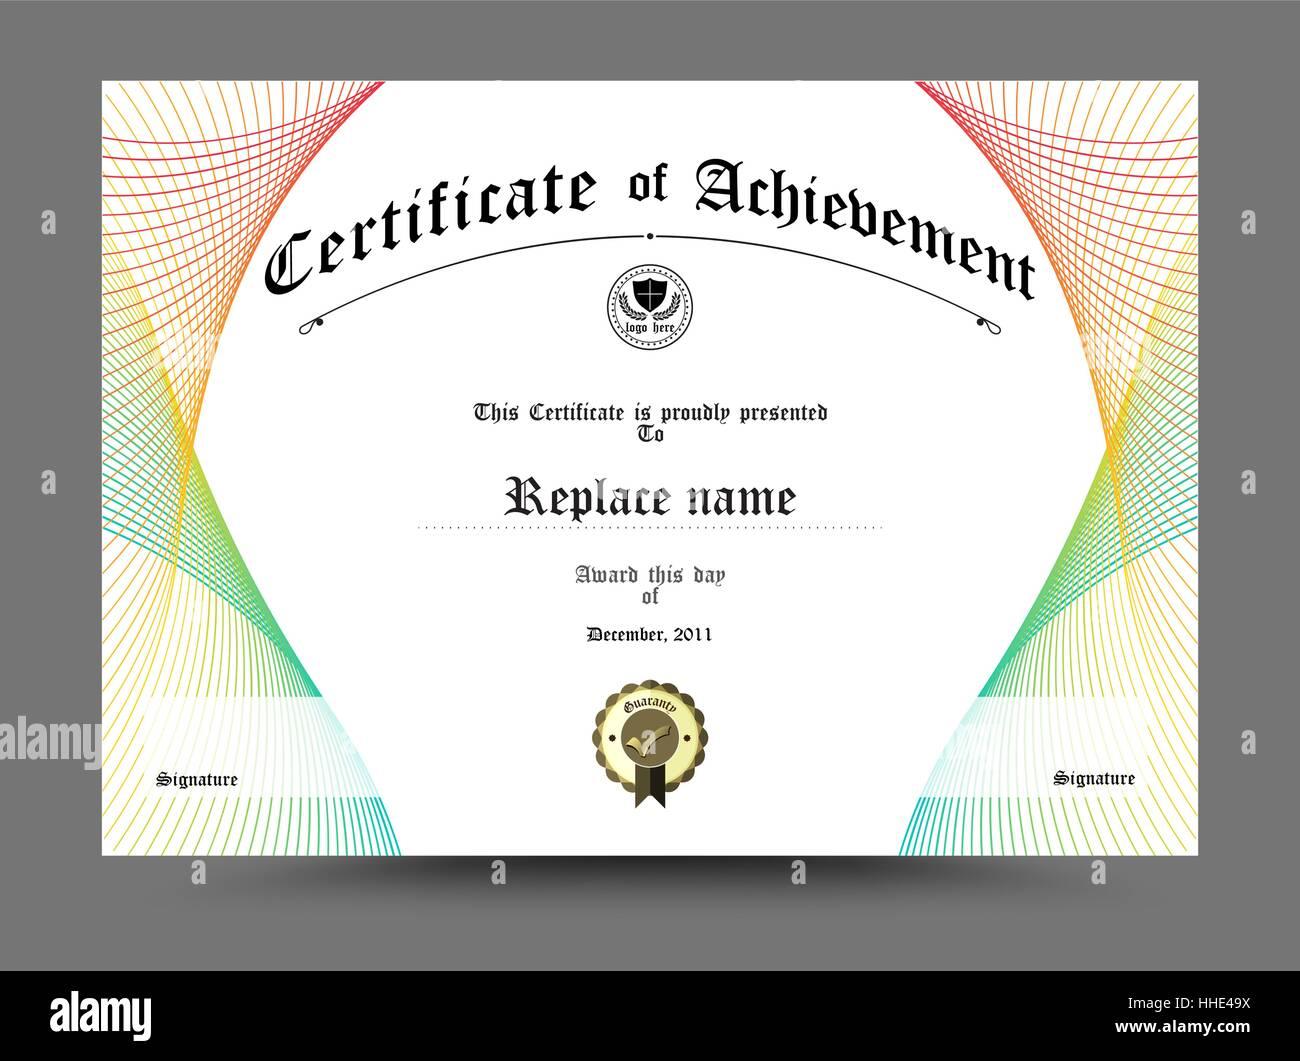 Diploma Border Stockfotos & Diploma Border Bilder - Alamy